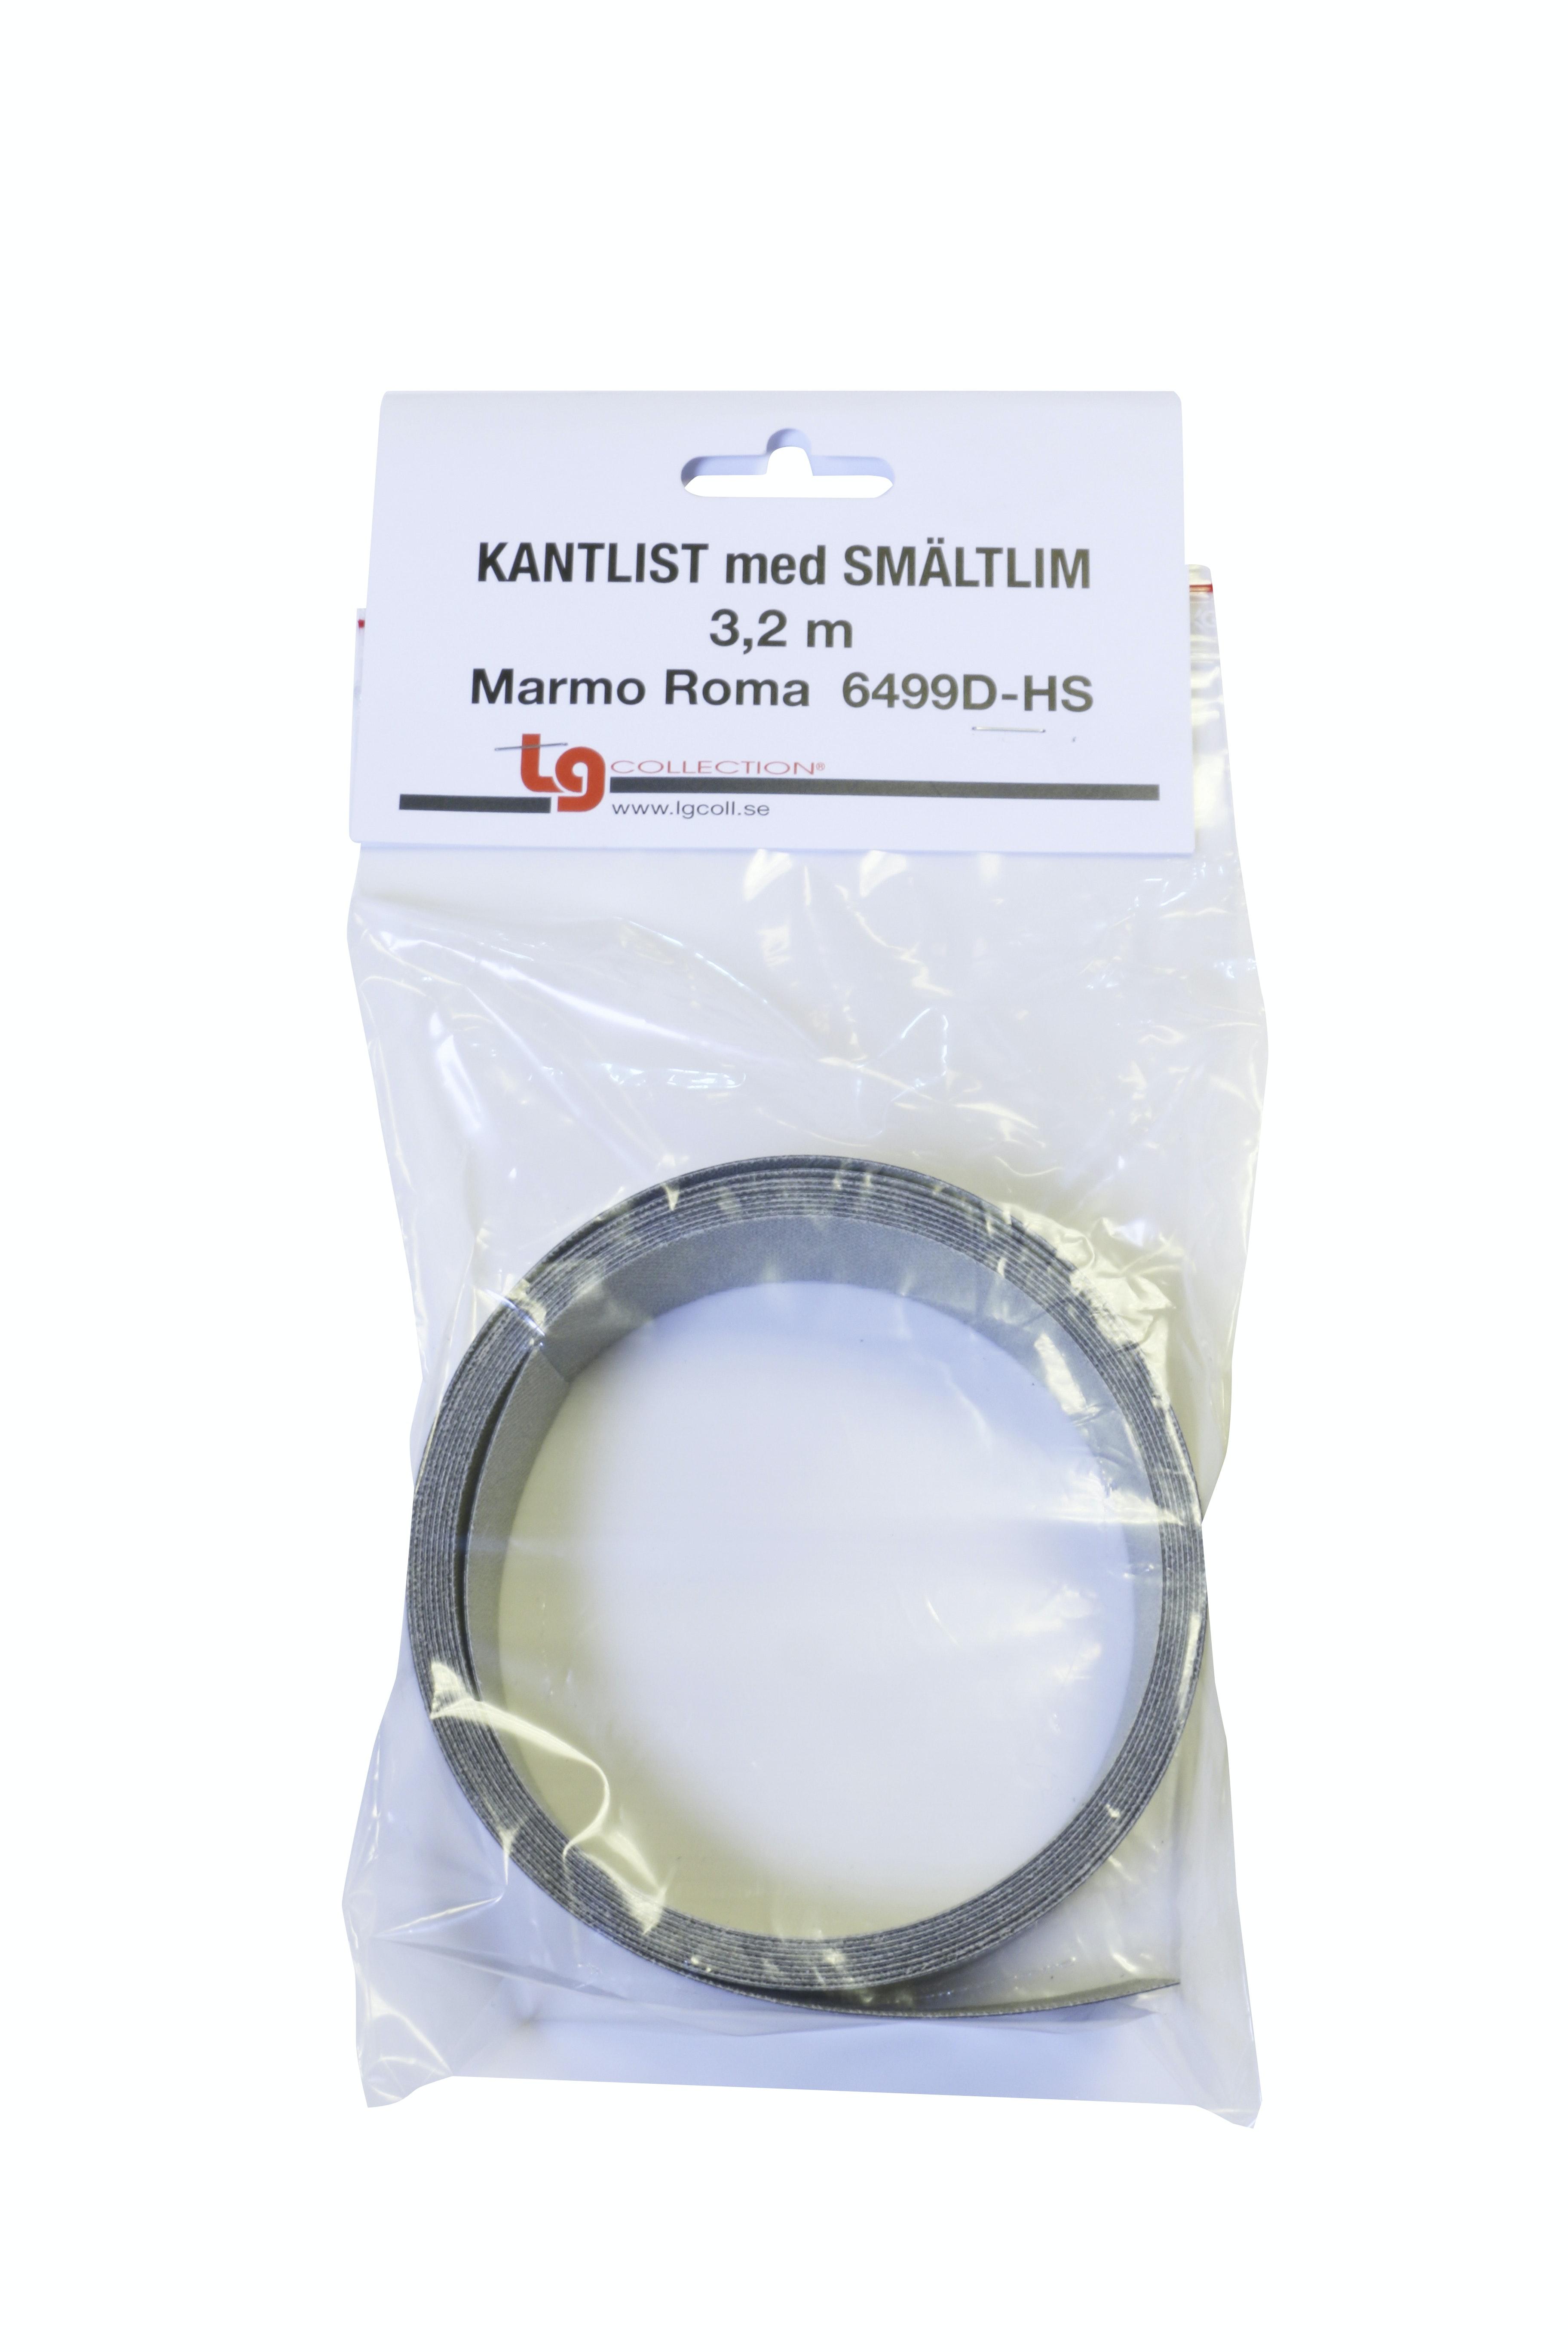 Kantband Sm 3,2m Marmo Roma Hs